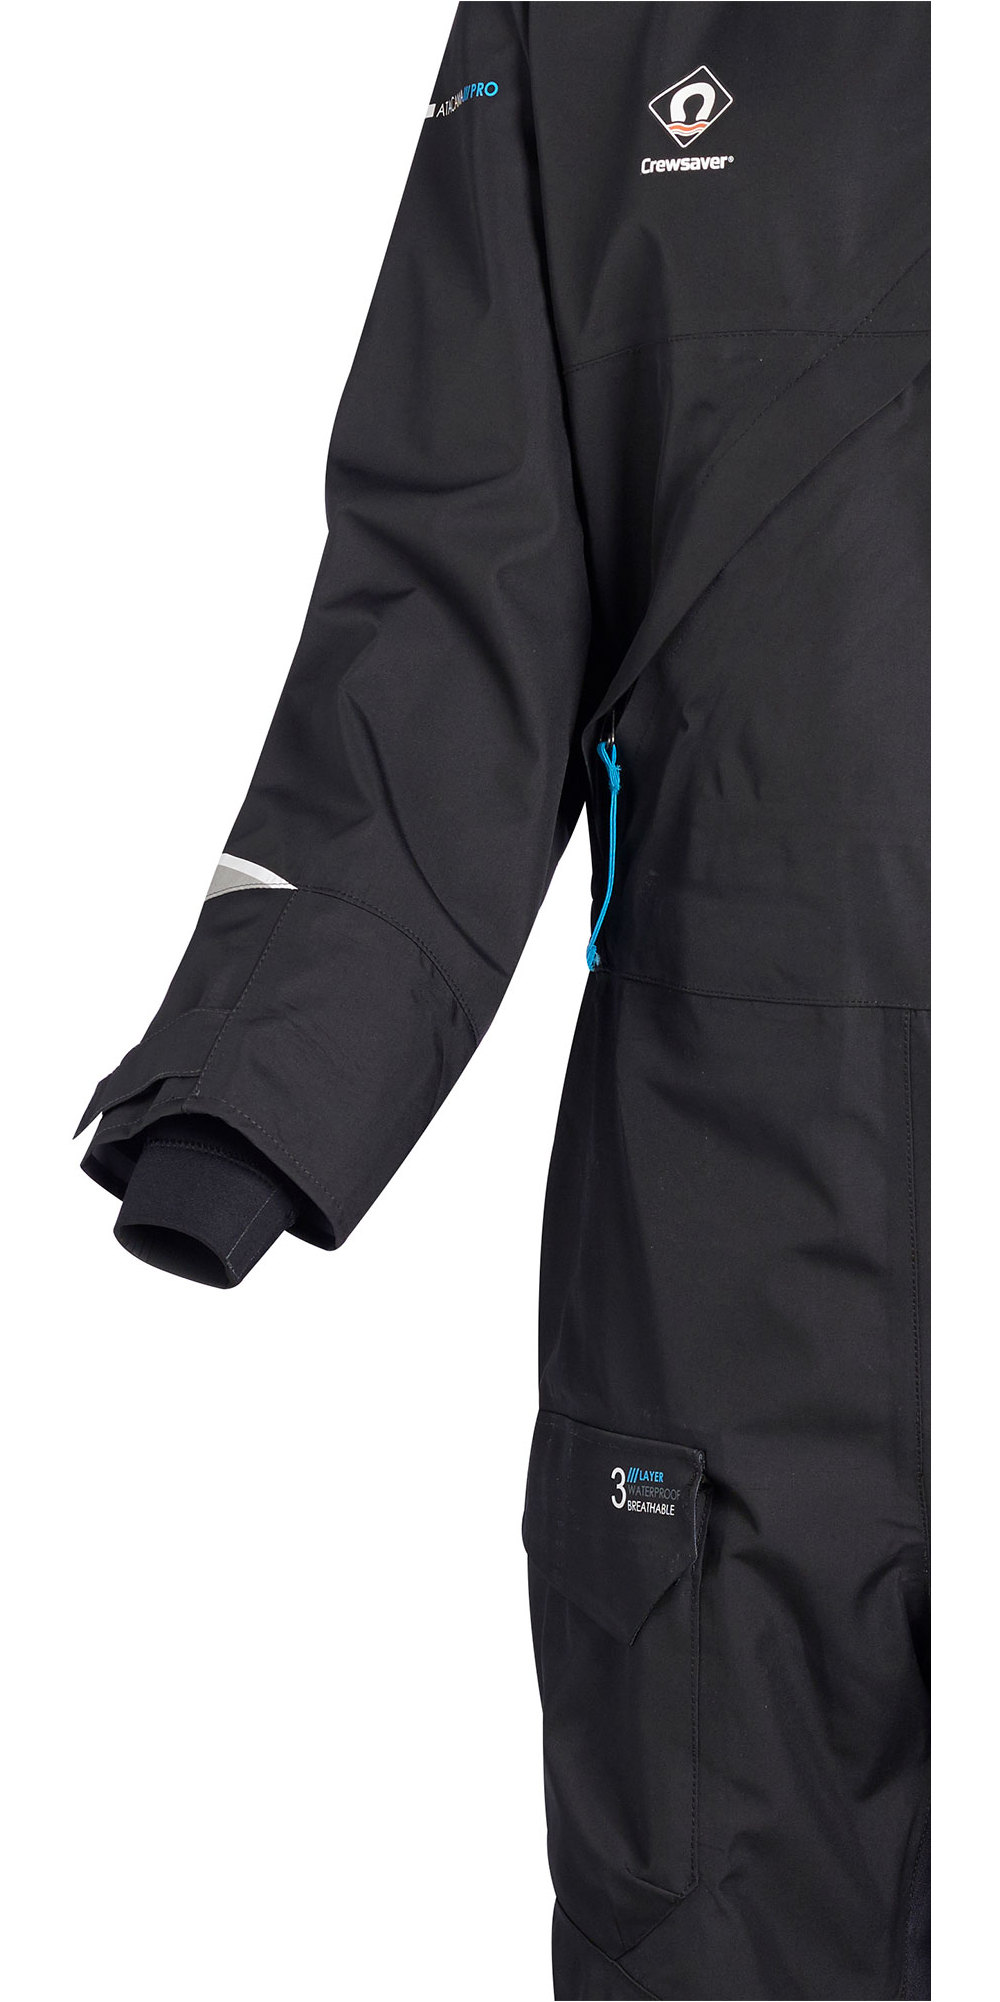 2020 Crewsaver Atacama Pro Drysuit Incluyendo Ropa Interior Negra 6556